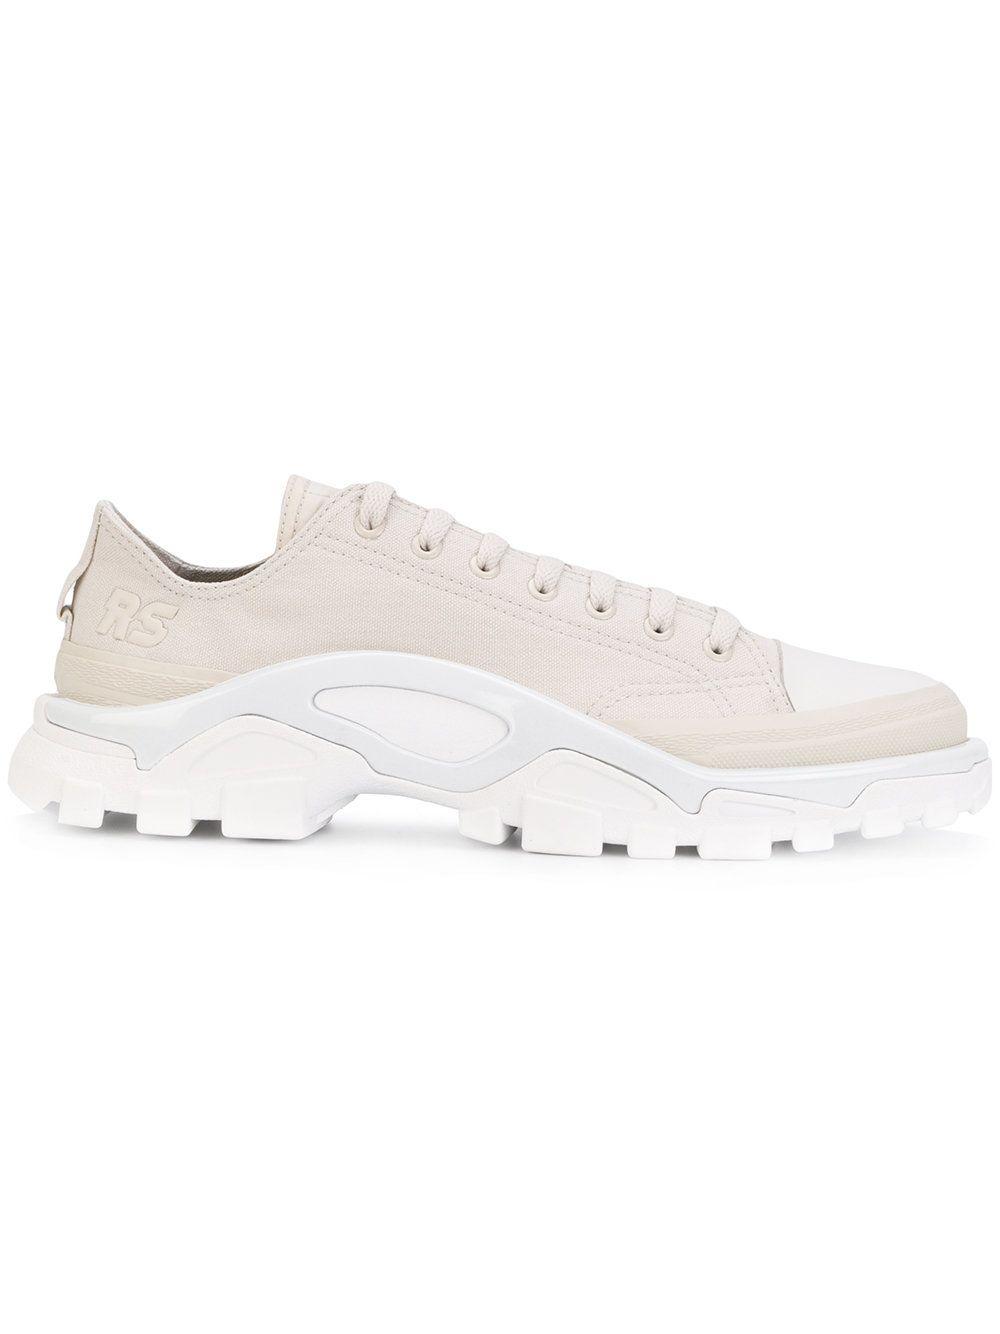 san francisco 09204 eb691 Adidas By Raf Simons Detroit Runner sneakers